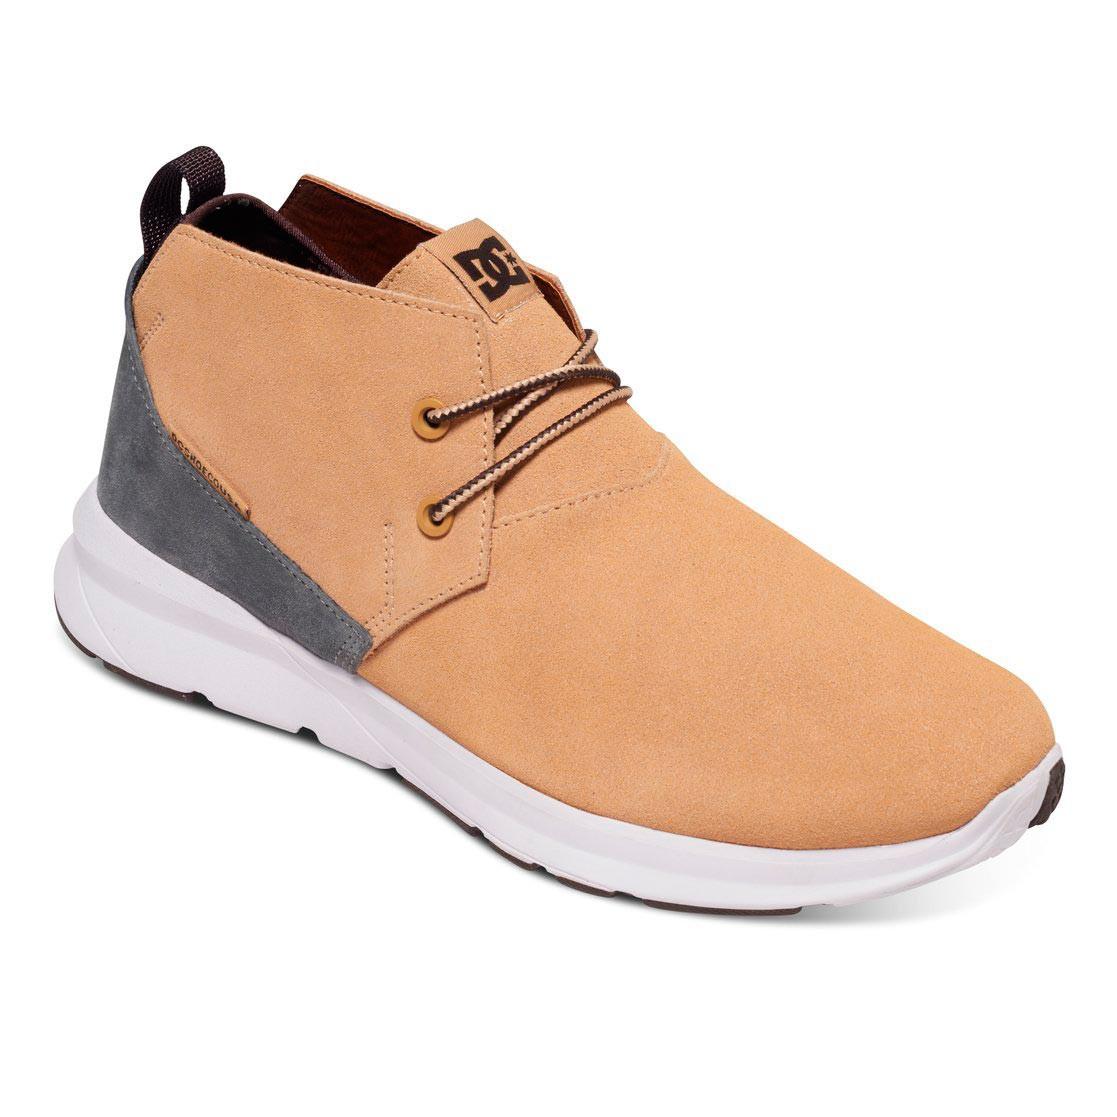 Zimní boty DC Ashlar tan